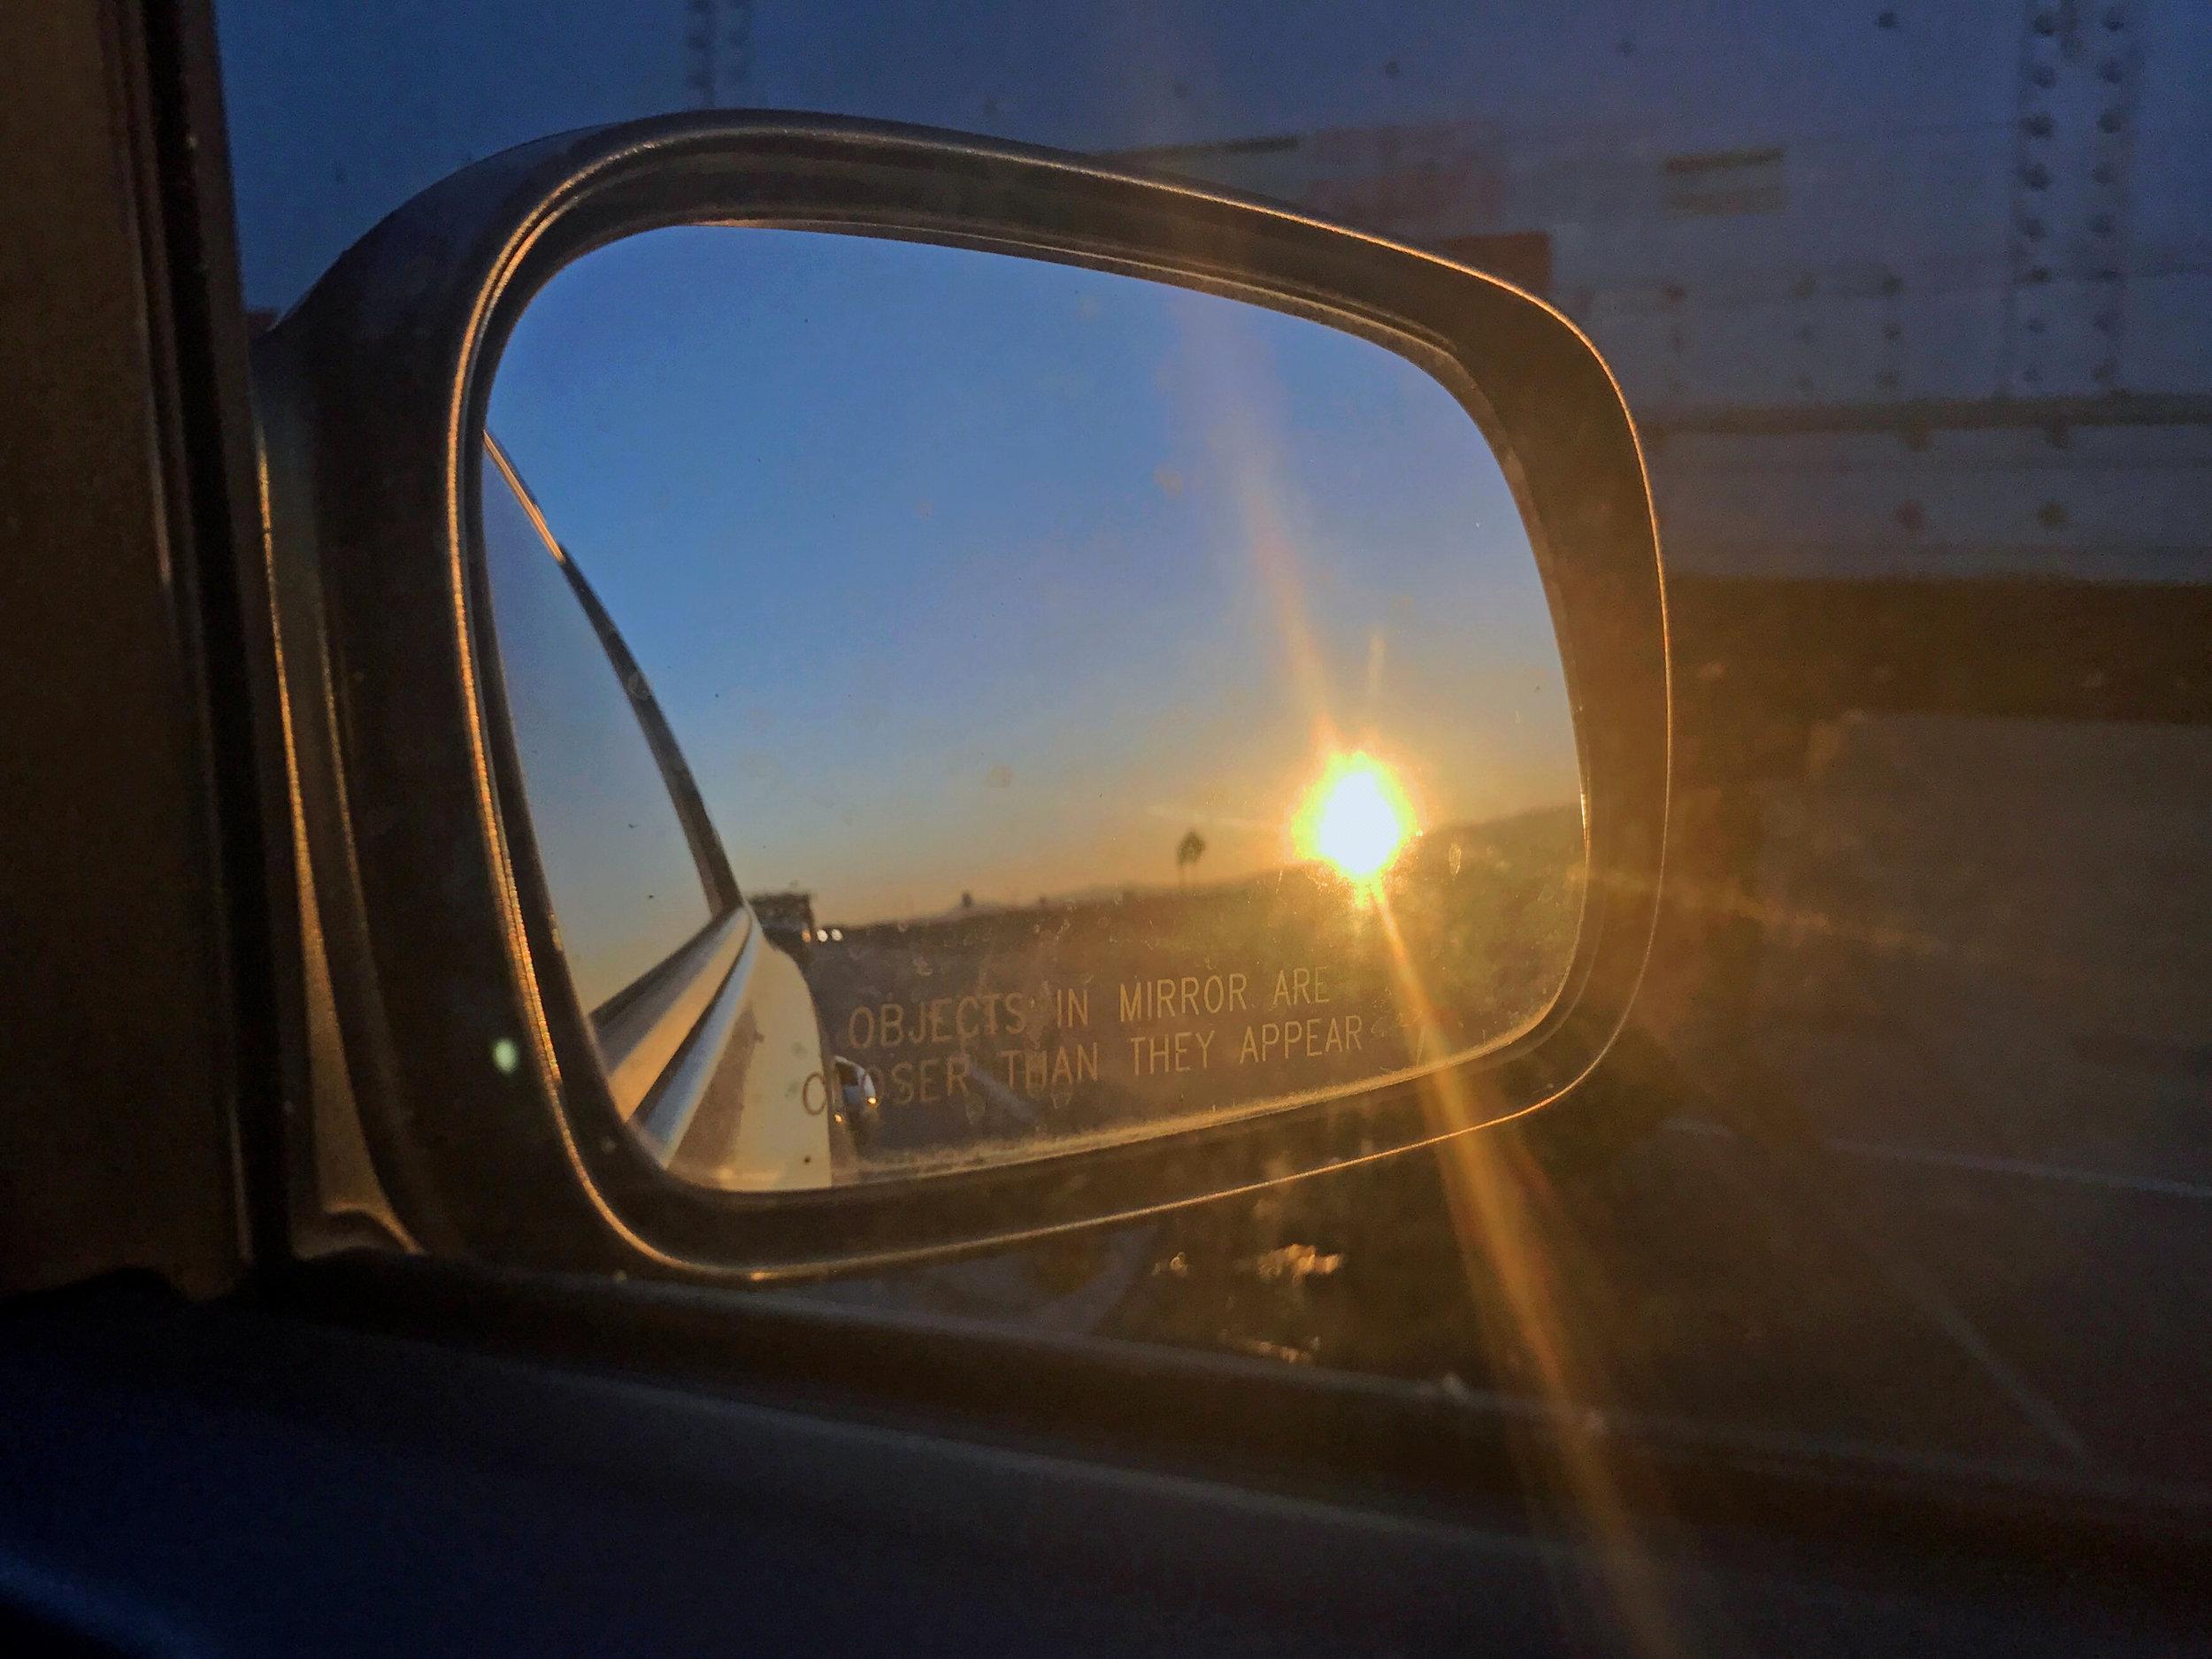 California Sunrise in the side mirror